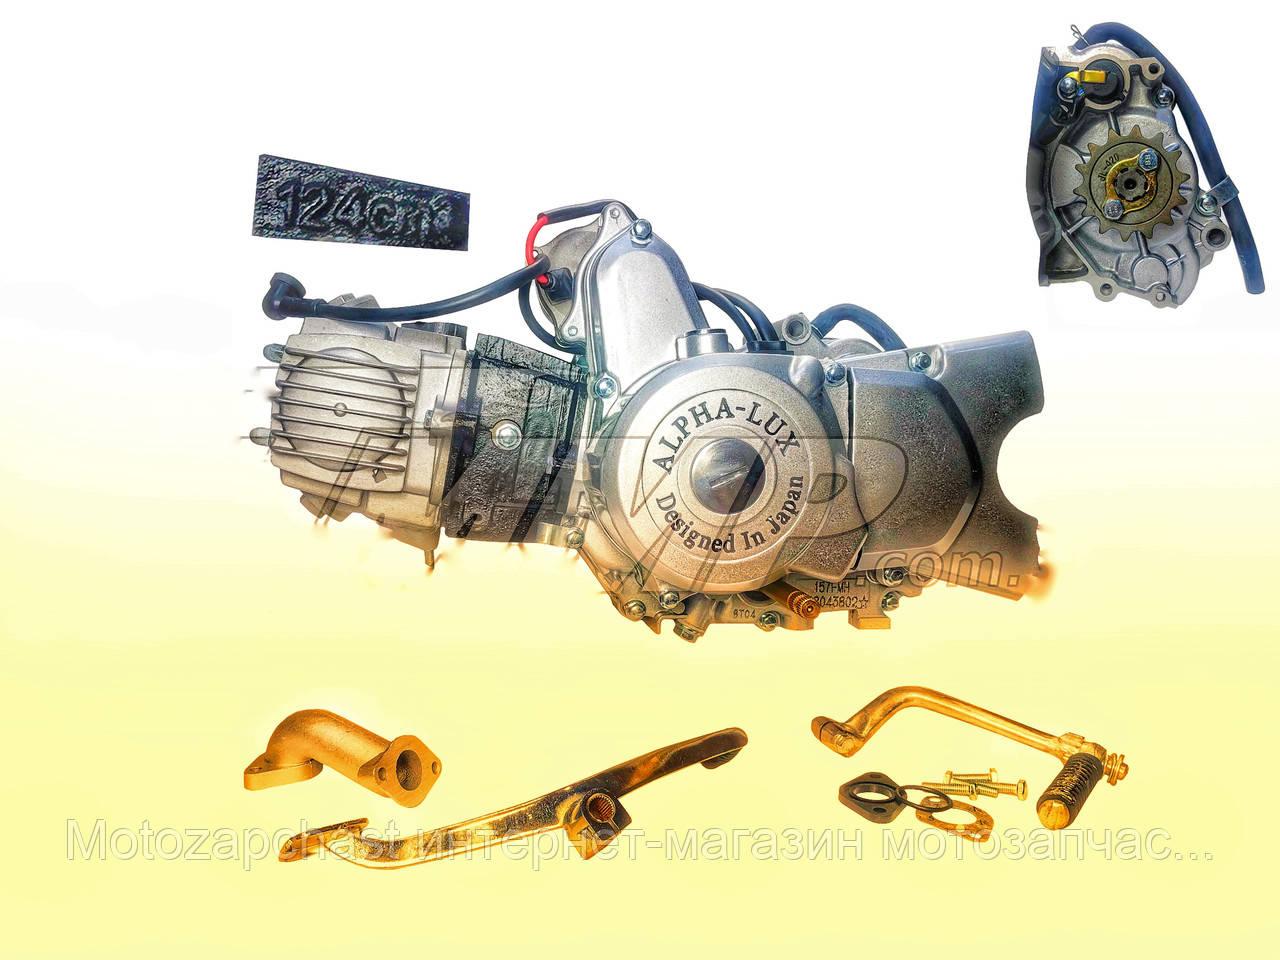 Двигатель Viper Active JH125 см3 автомат AlphaLux